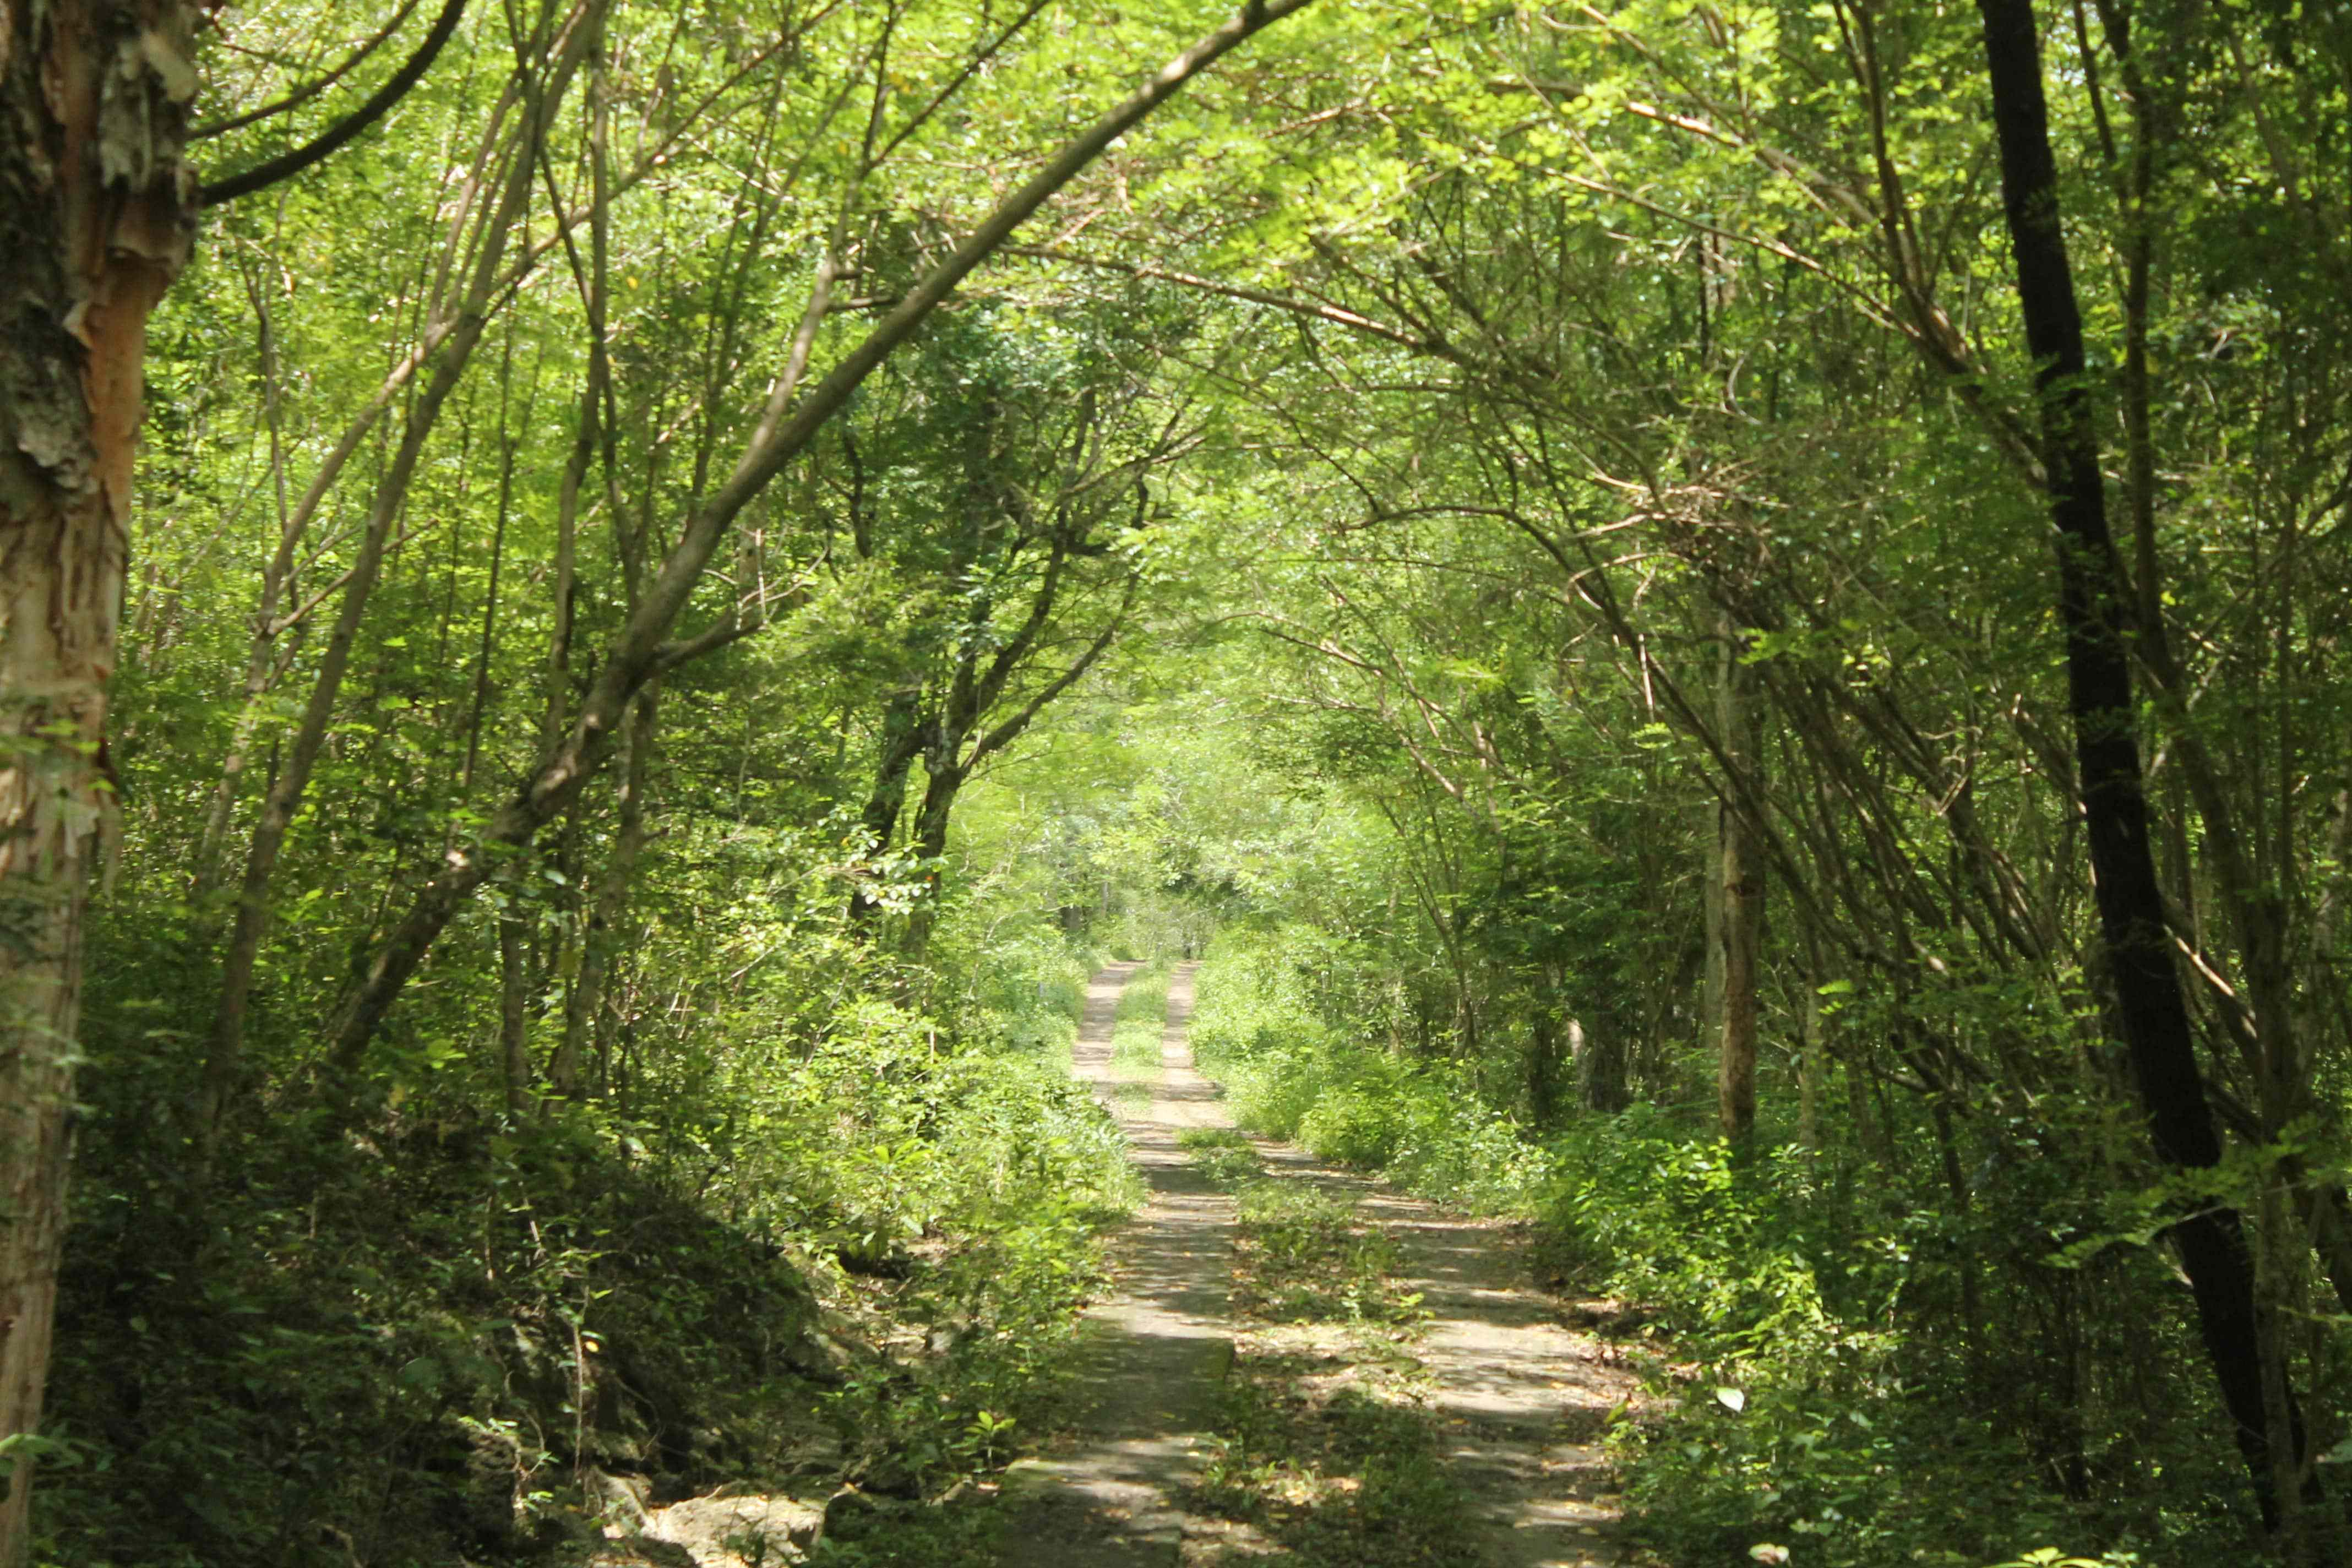 Hutan Wanagama Jelajah Alam Aman Pemula Balijogja Kab Gunungkidul